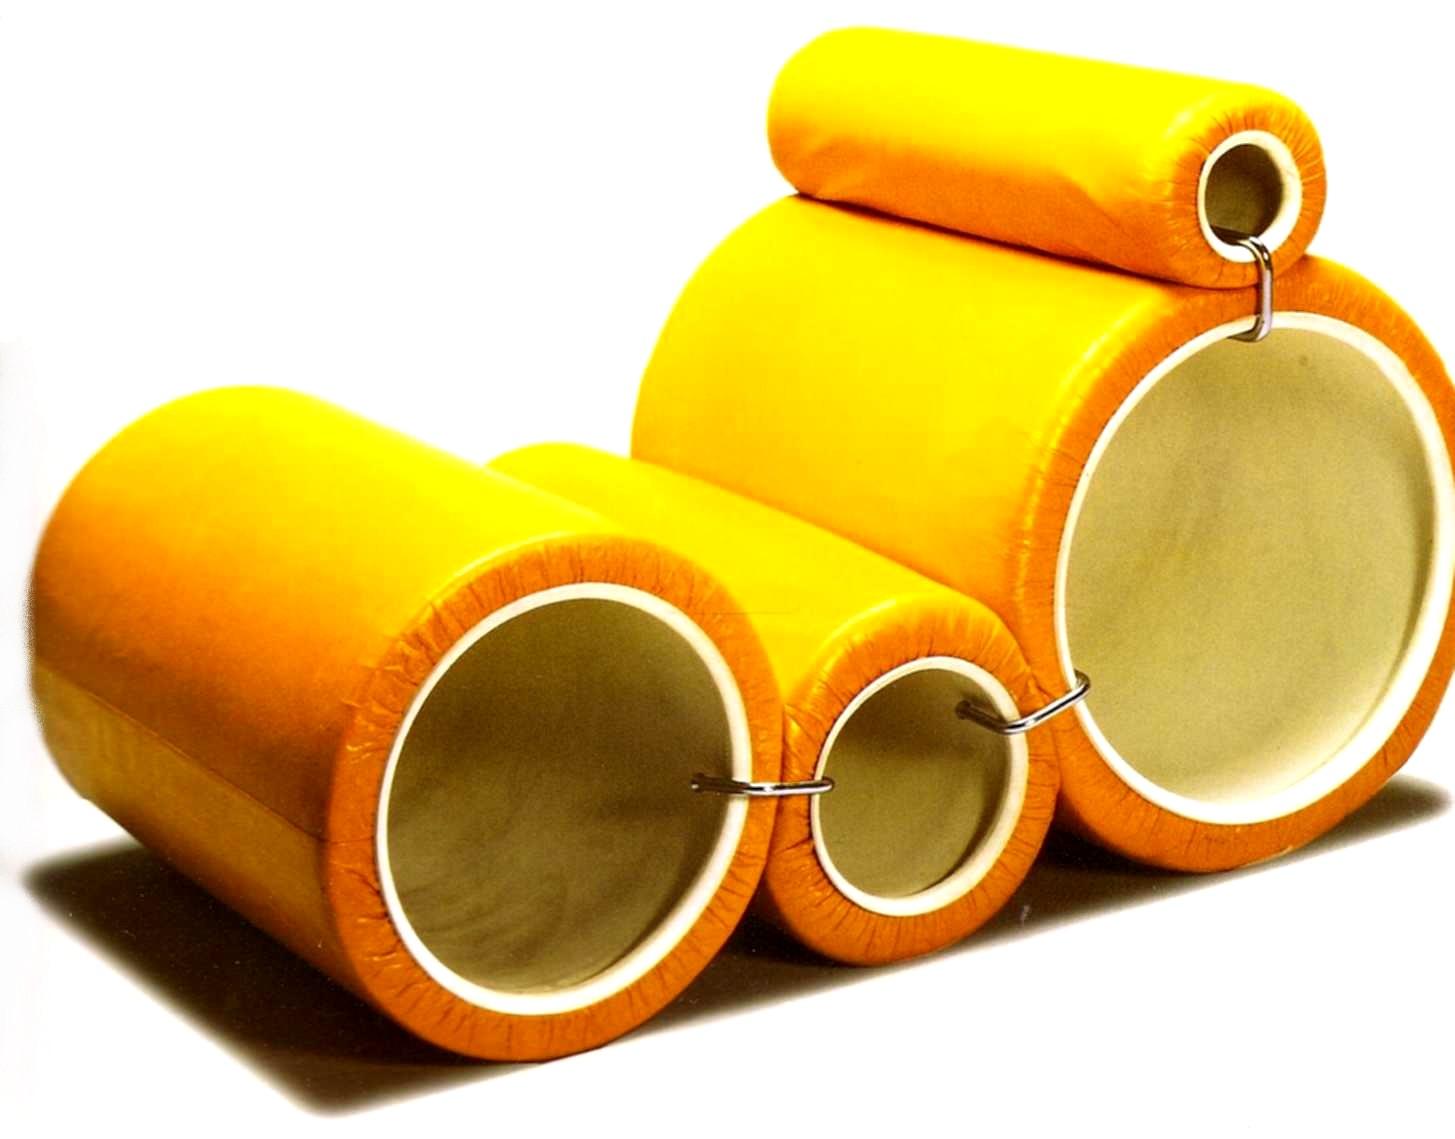 Design ann es 60 tube chair de joe colombo lavieenrouge for Architecture annees 60